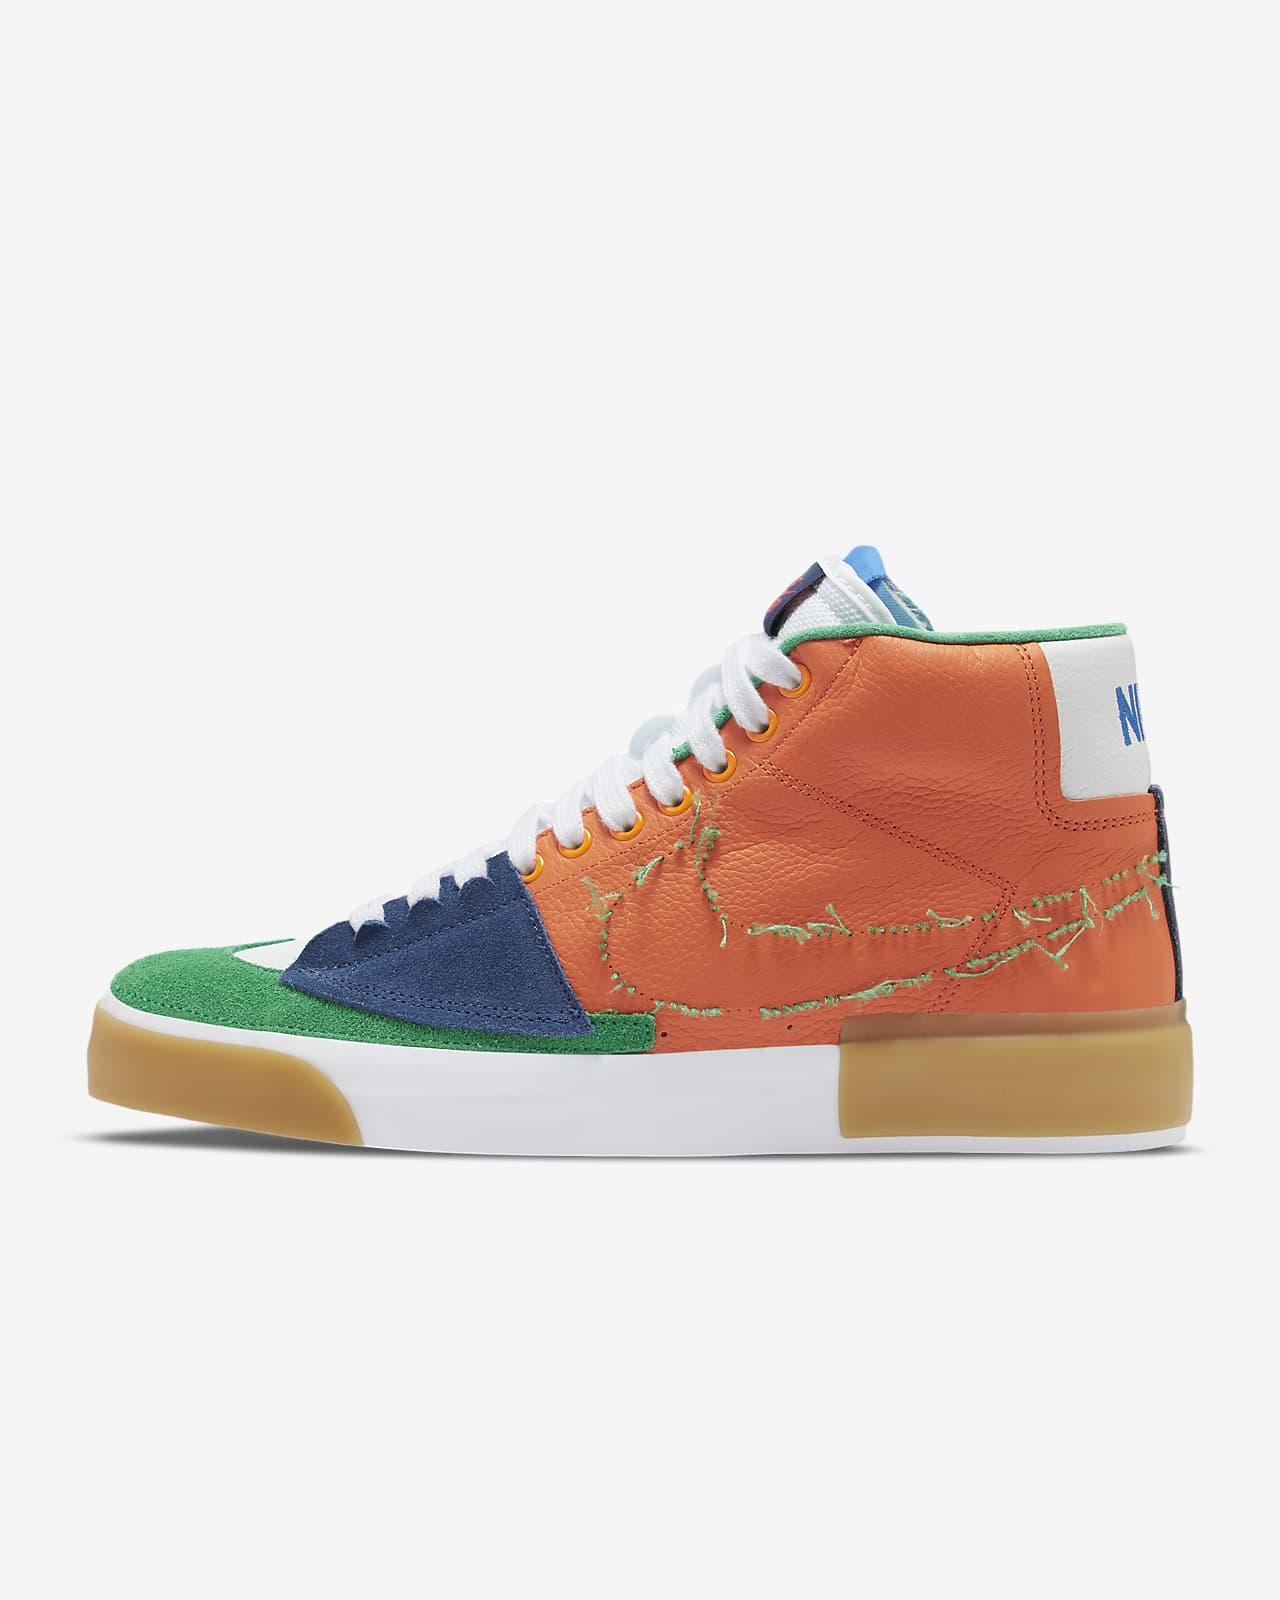 Nike SB Zoom Blazer Mid Edge Skateboardschuh